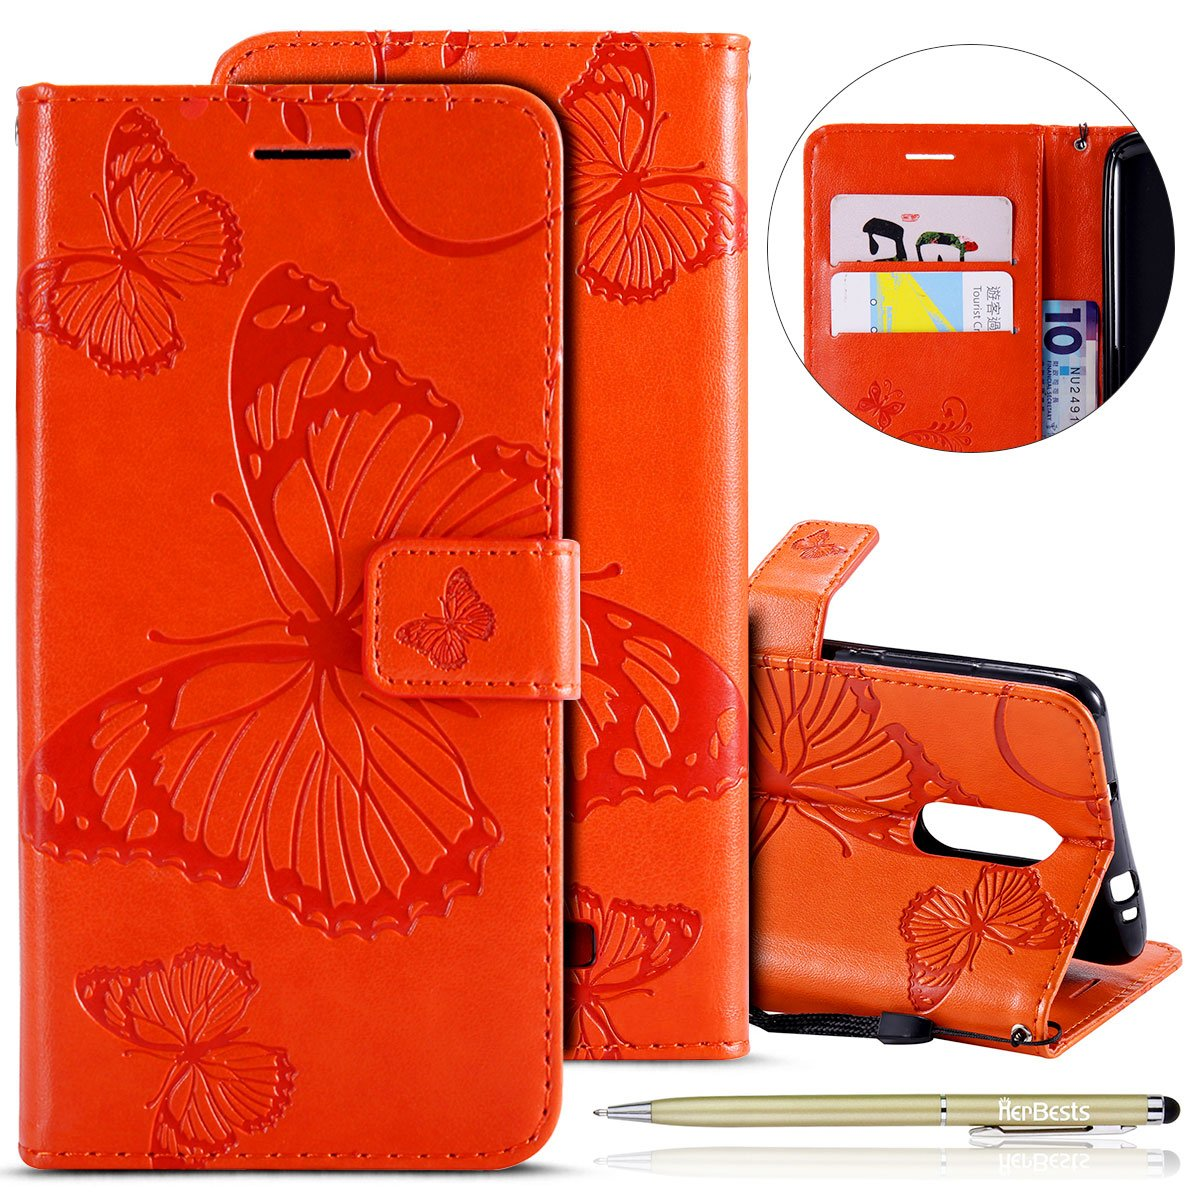 Herbests Kompatibel mit Leder Handy Schutzh/ülle Xiaomi Redmi Note 3 Lederh/ülle Schmetterling Muster Leder Handyh/ülle Handytasche Brieftasche Ledertasche Bookstyle Flip Case Cover Klapph/ülle,lila